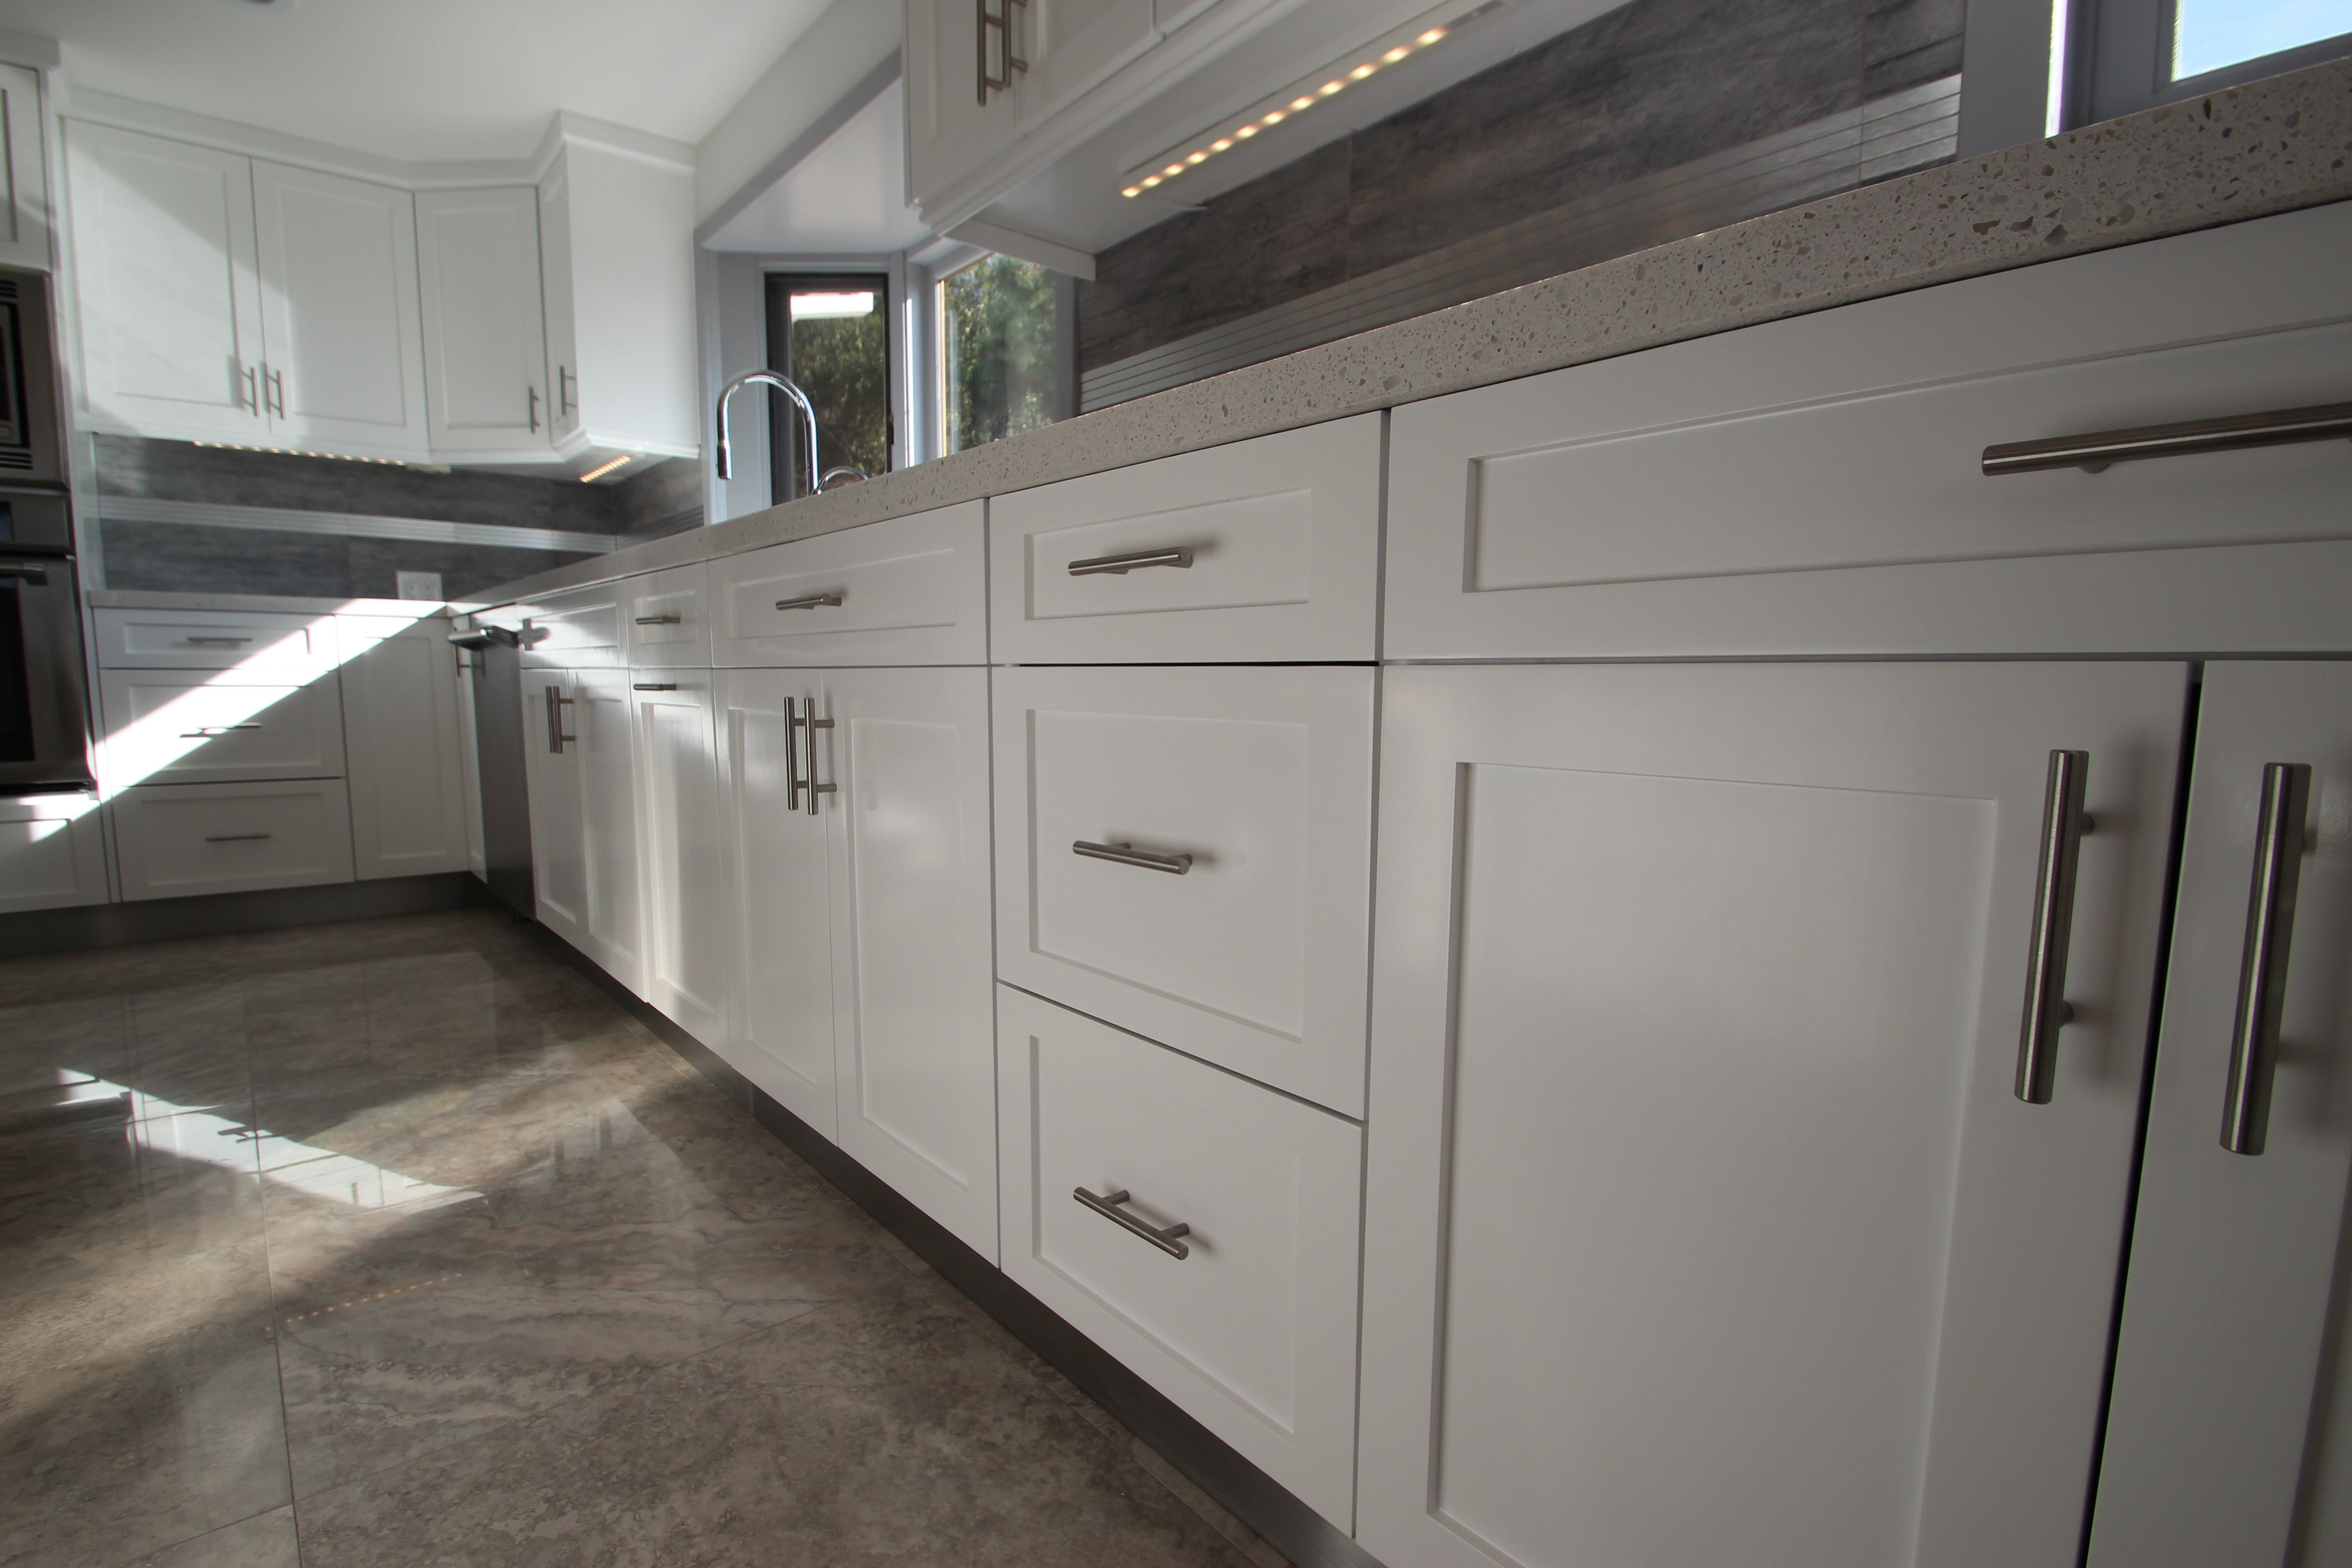 Shaker Kitchen Cabinets 27 Inch Sink Pin By Remodeler La On Modern Los Angeles